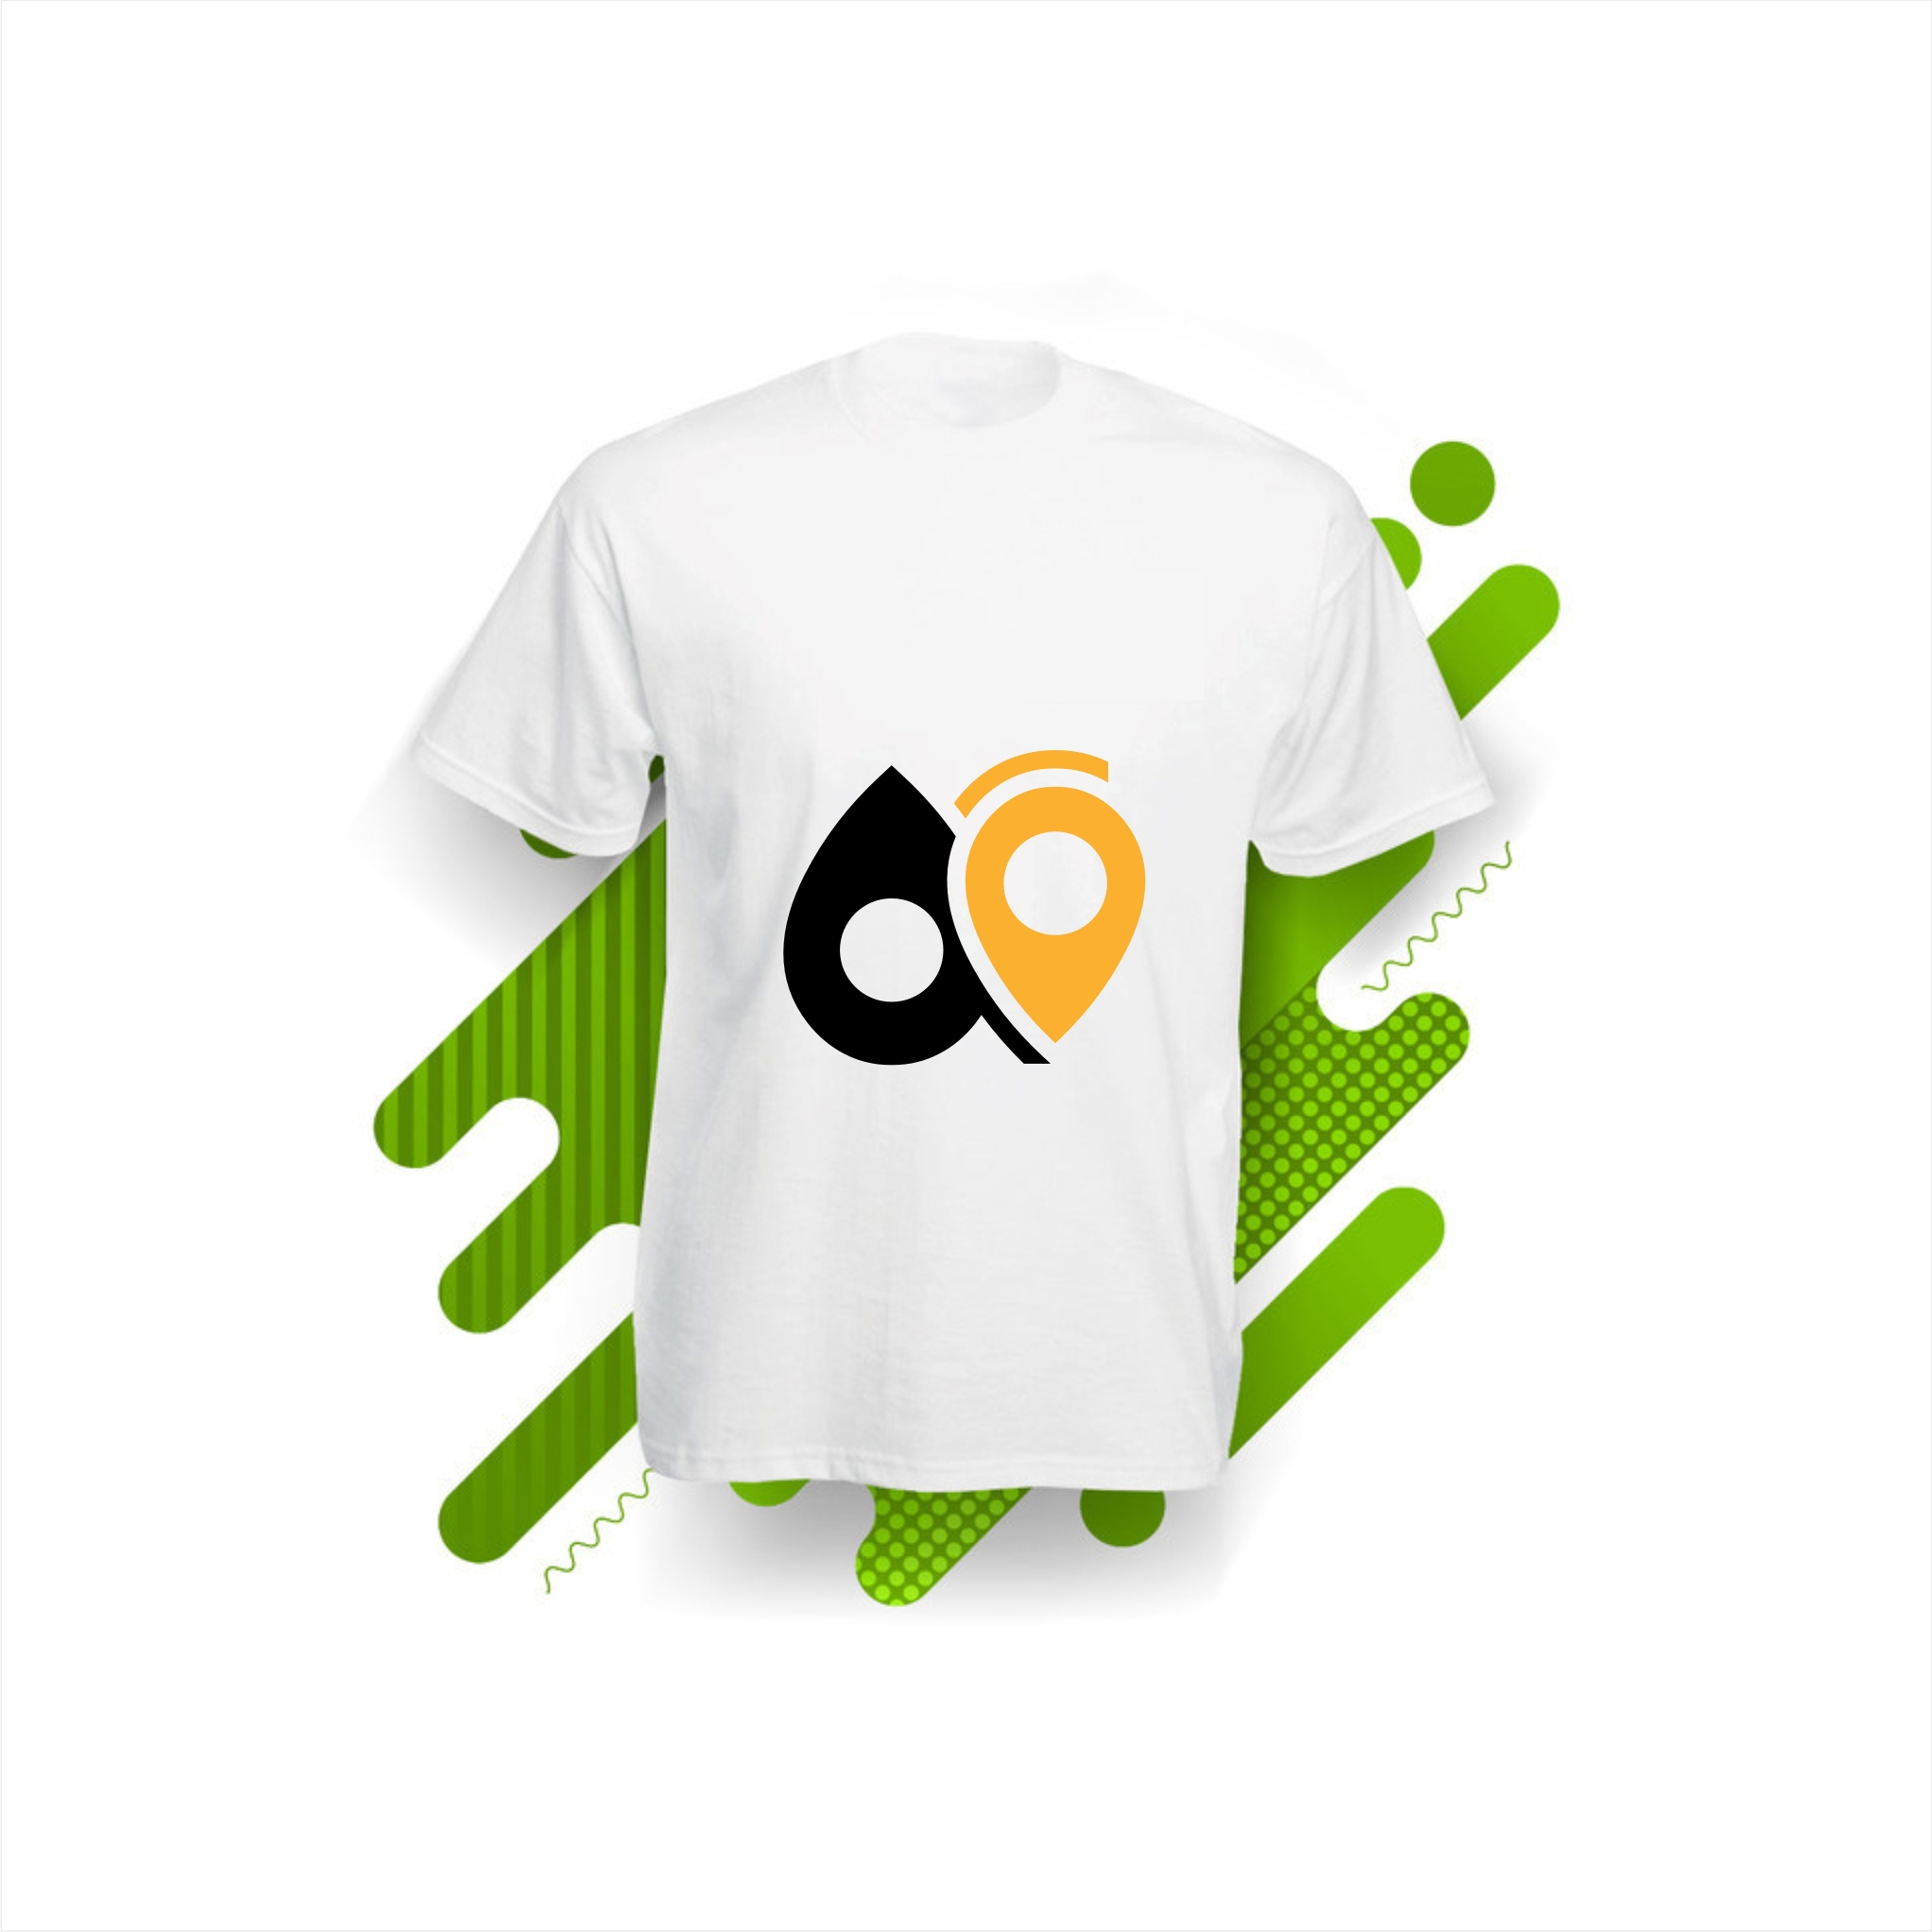 Разработка логотипа Атлас Байкала фото f_3925b1769f69bb8a.jpg